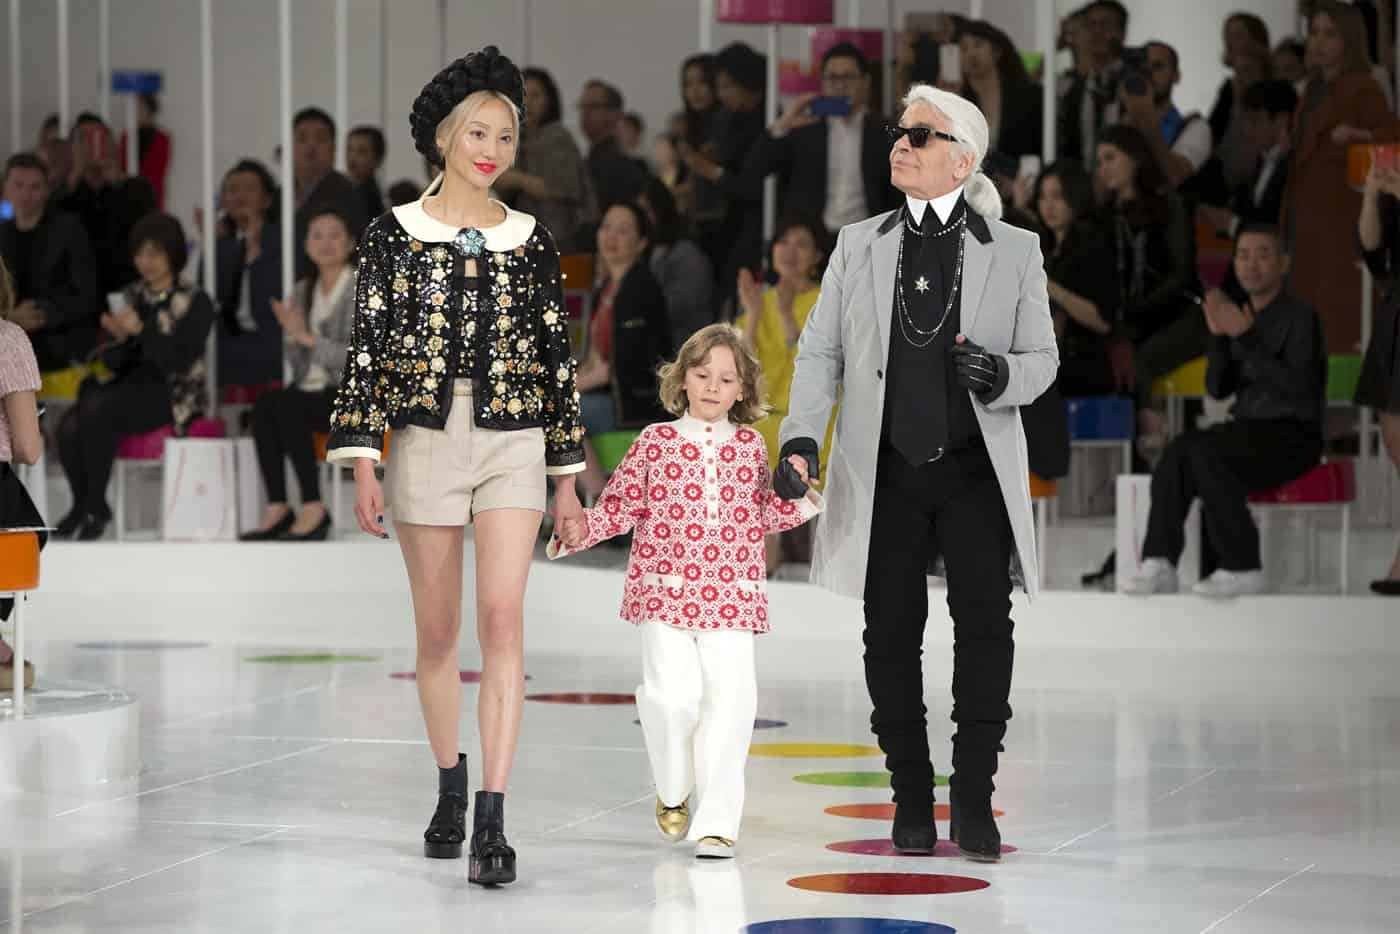 2017 summer fashion trends - Karl Lagerfeld Kids Collection Spring Summer 2016 Dress